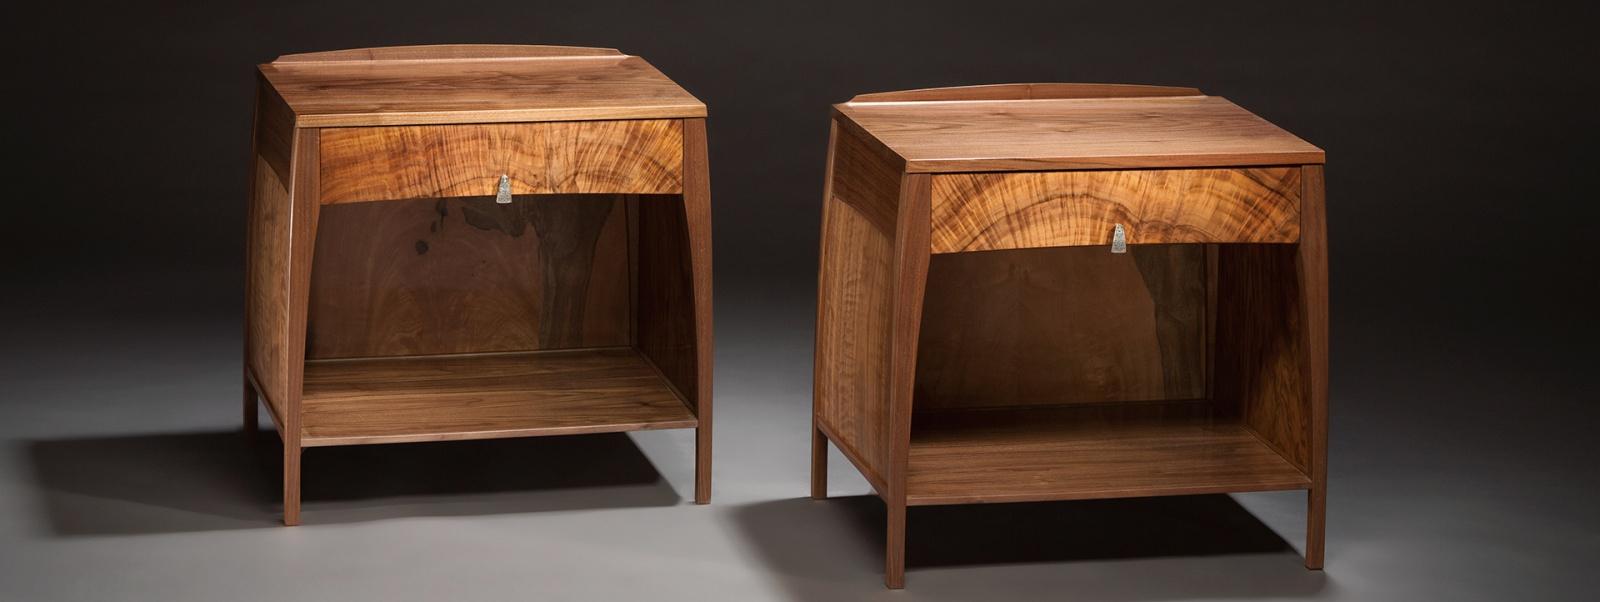 Custom handmade night stands created by furniture master John Cameron